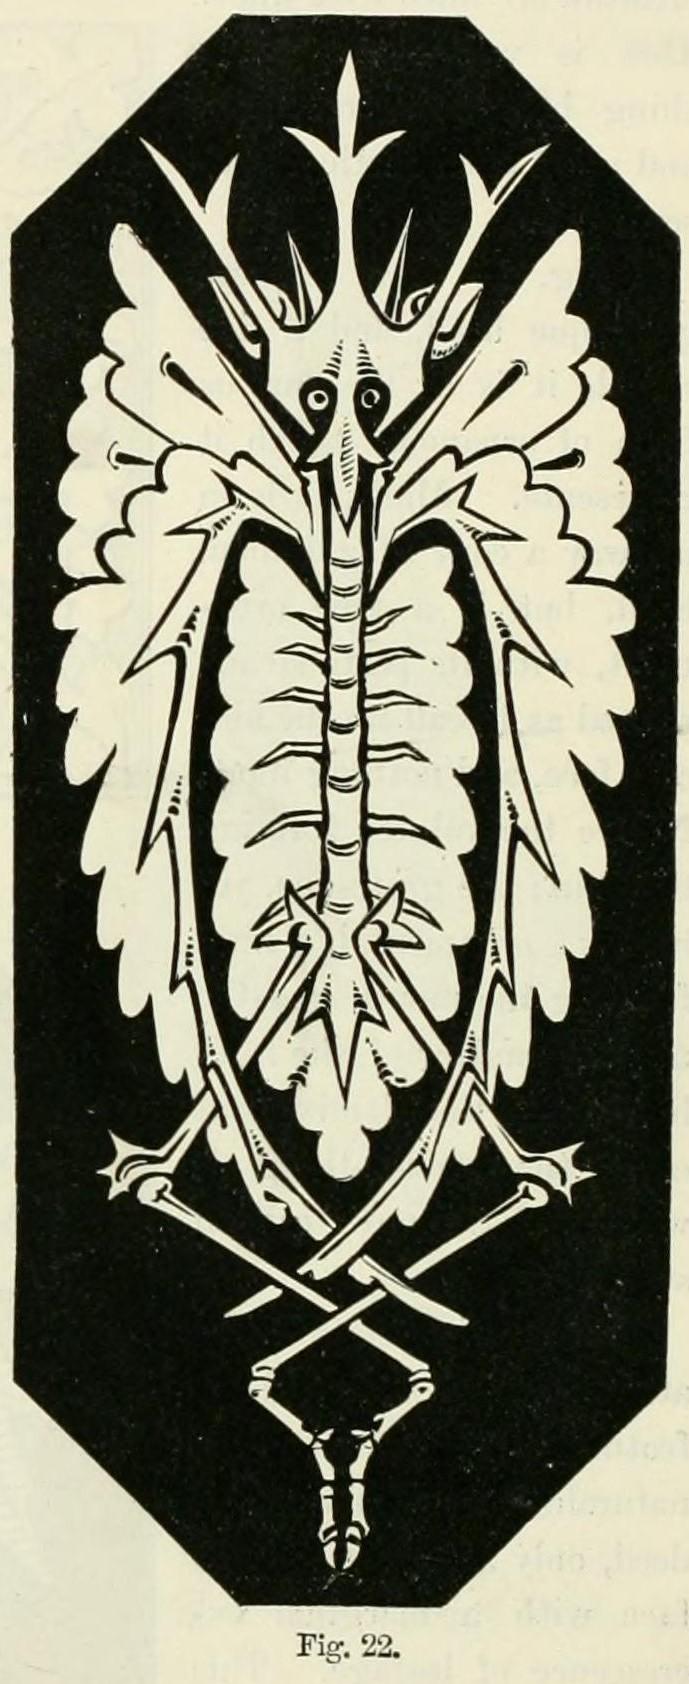 Figure 22, page 28.